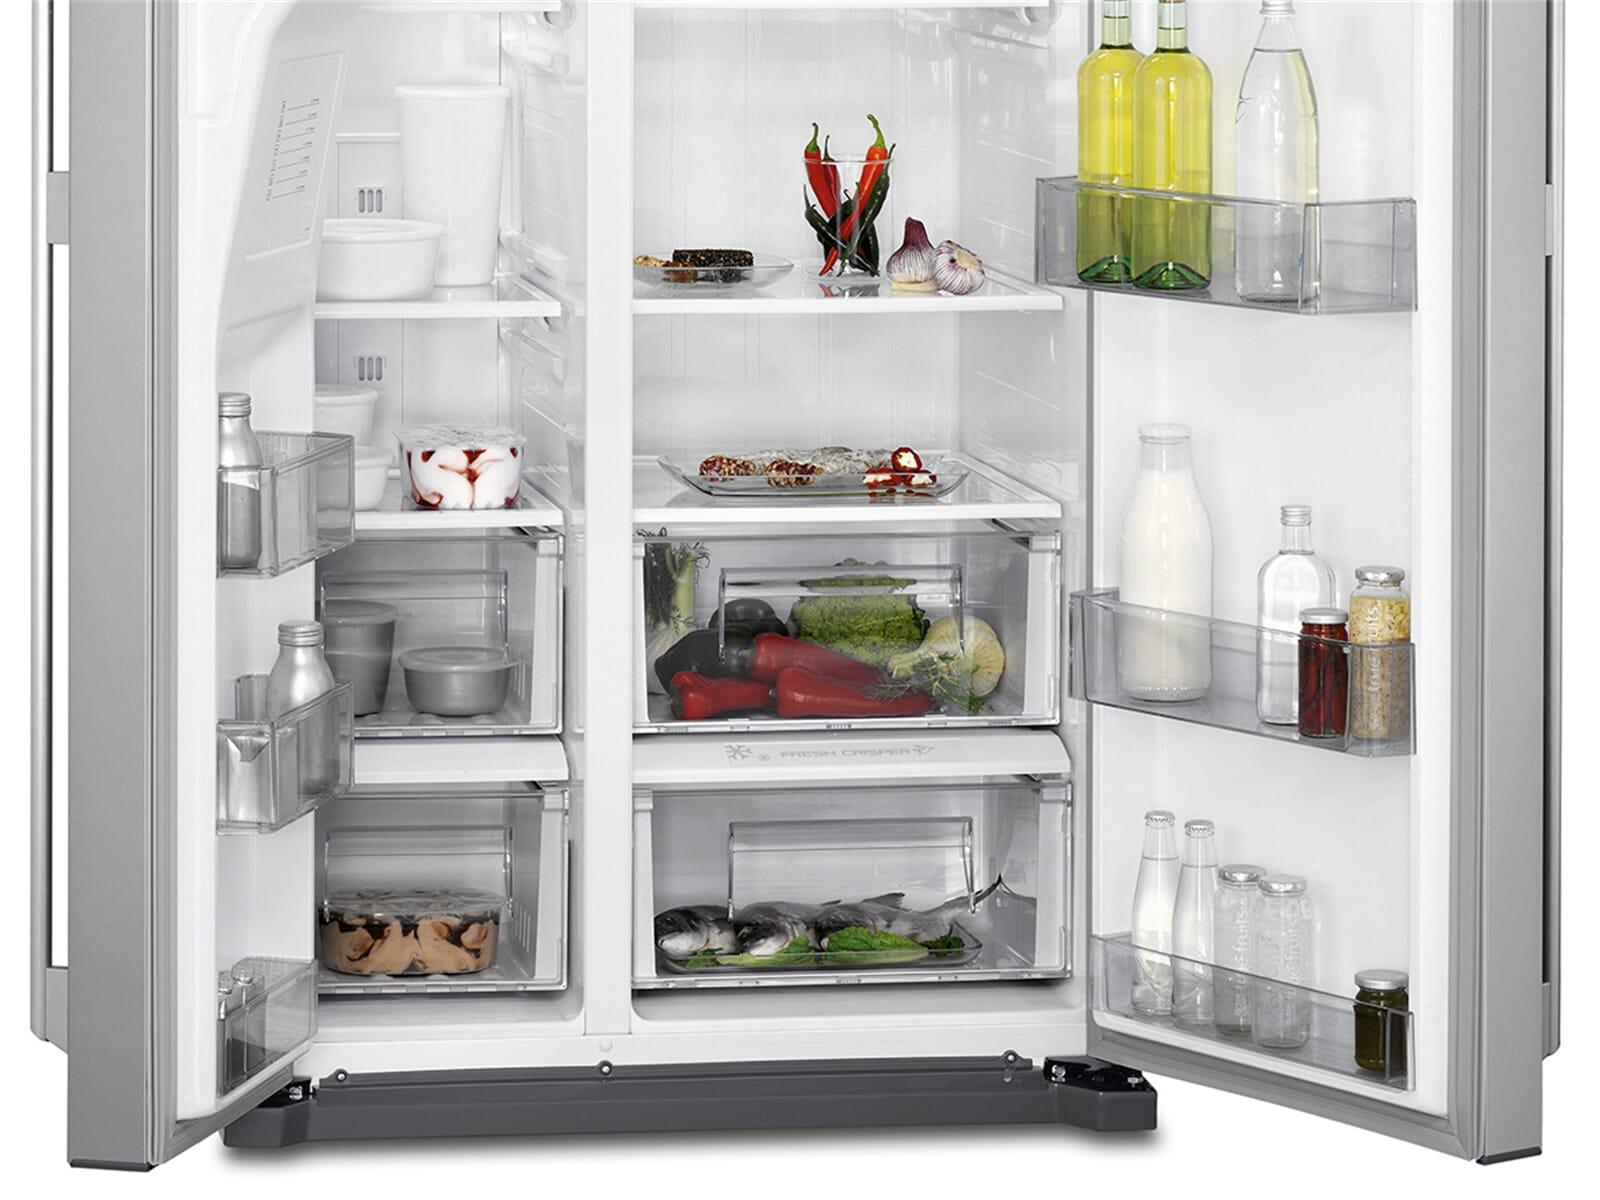 Aeg Kühlschrank Side By Side : Aeg rmb nx side by side kühl gefrier kombination edelstahl look